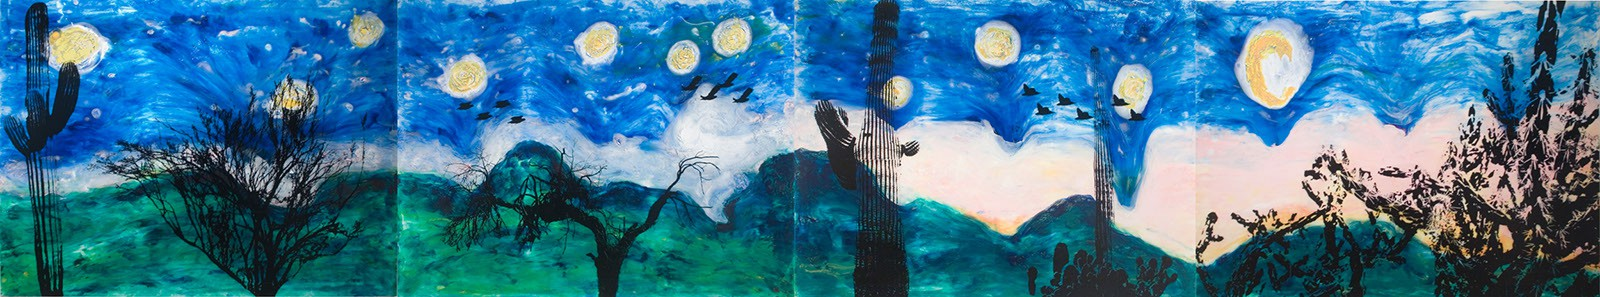 "Dead Desert Night Series, 2007 48"" x 36"" Liquid Plastic, Oil Paint, Porcelain, Silk Screen, on Canvas. SOLD"